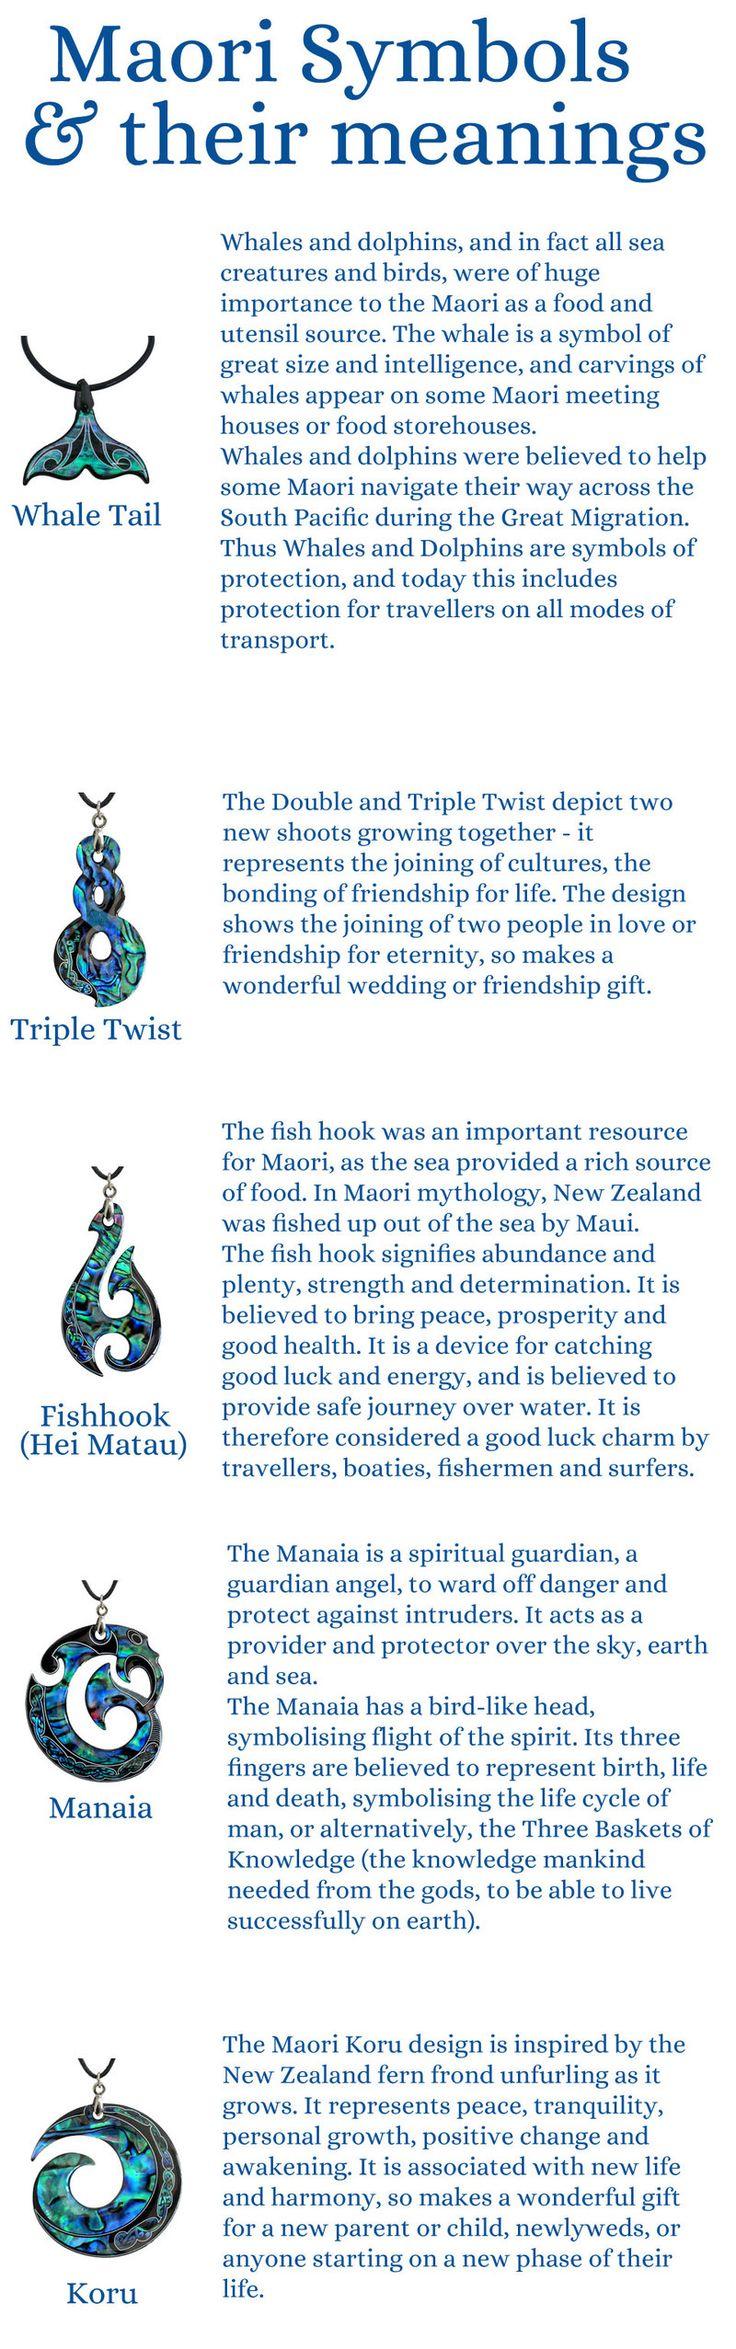 Maori Symbols